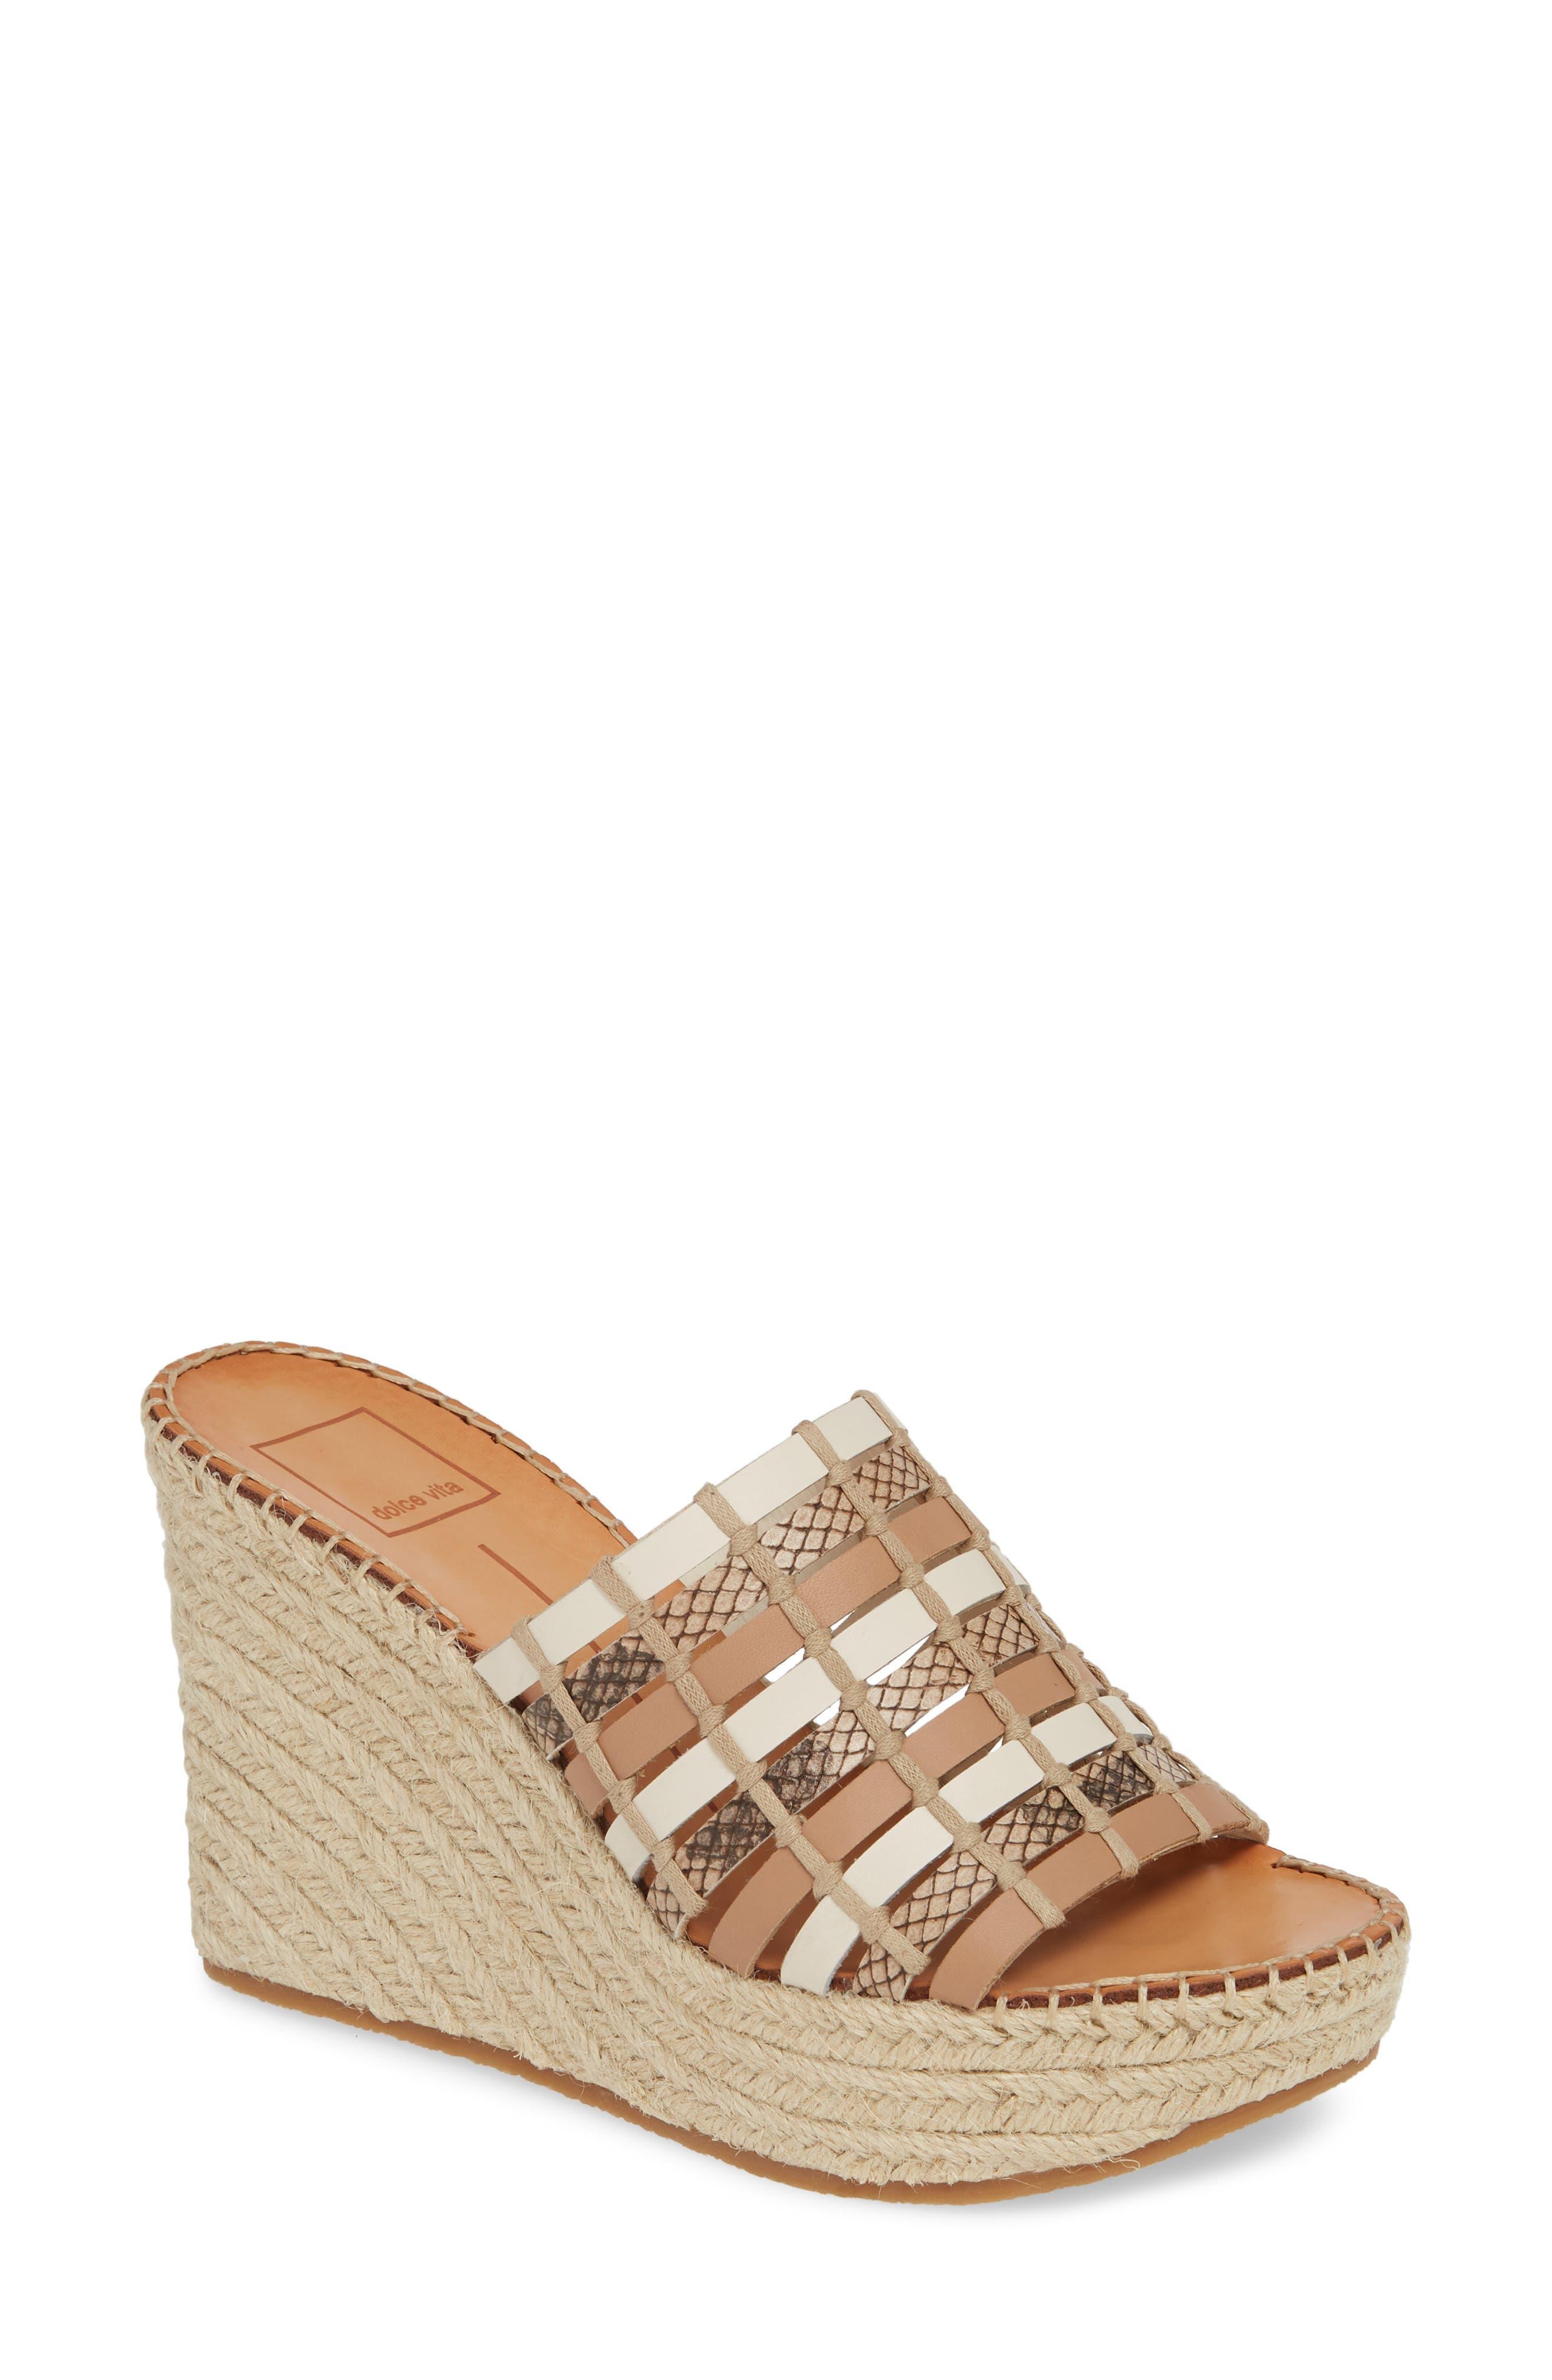 Dolce Vita Prue Espadrille Wedge Slide Sandal- Brown